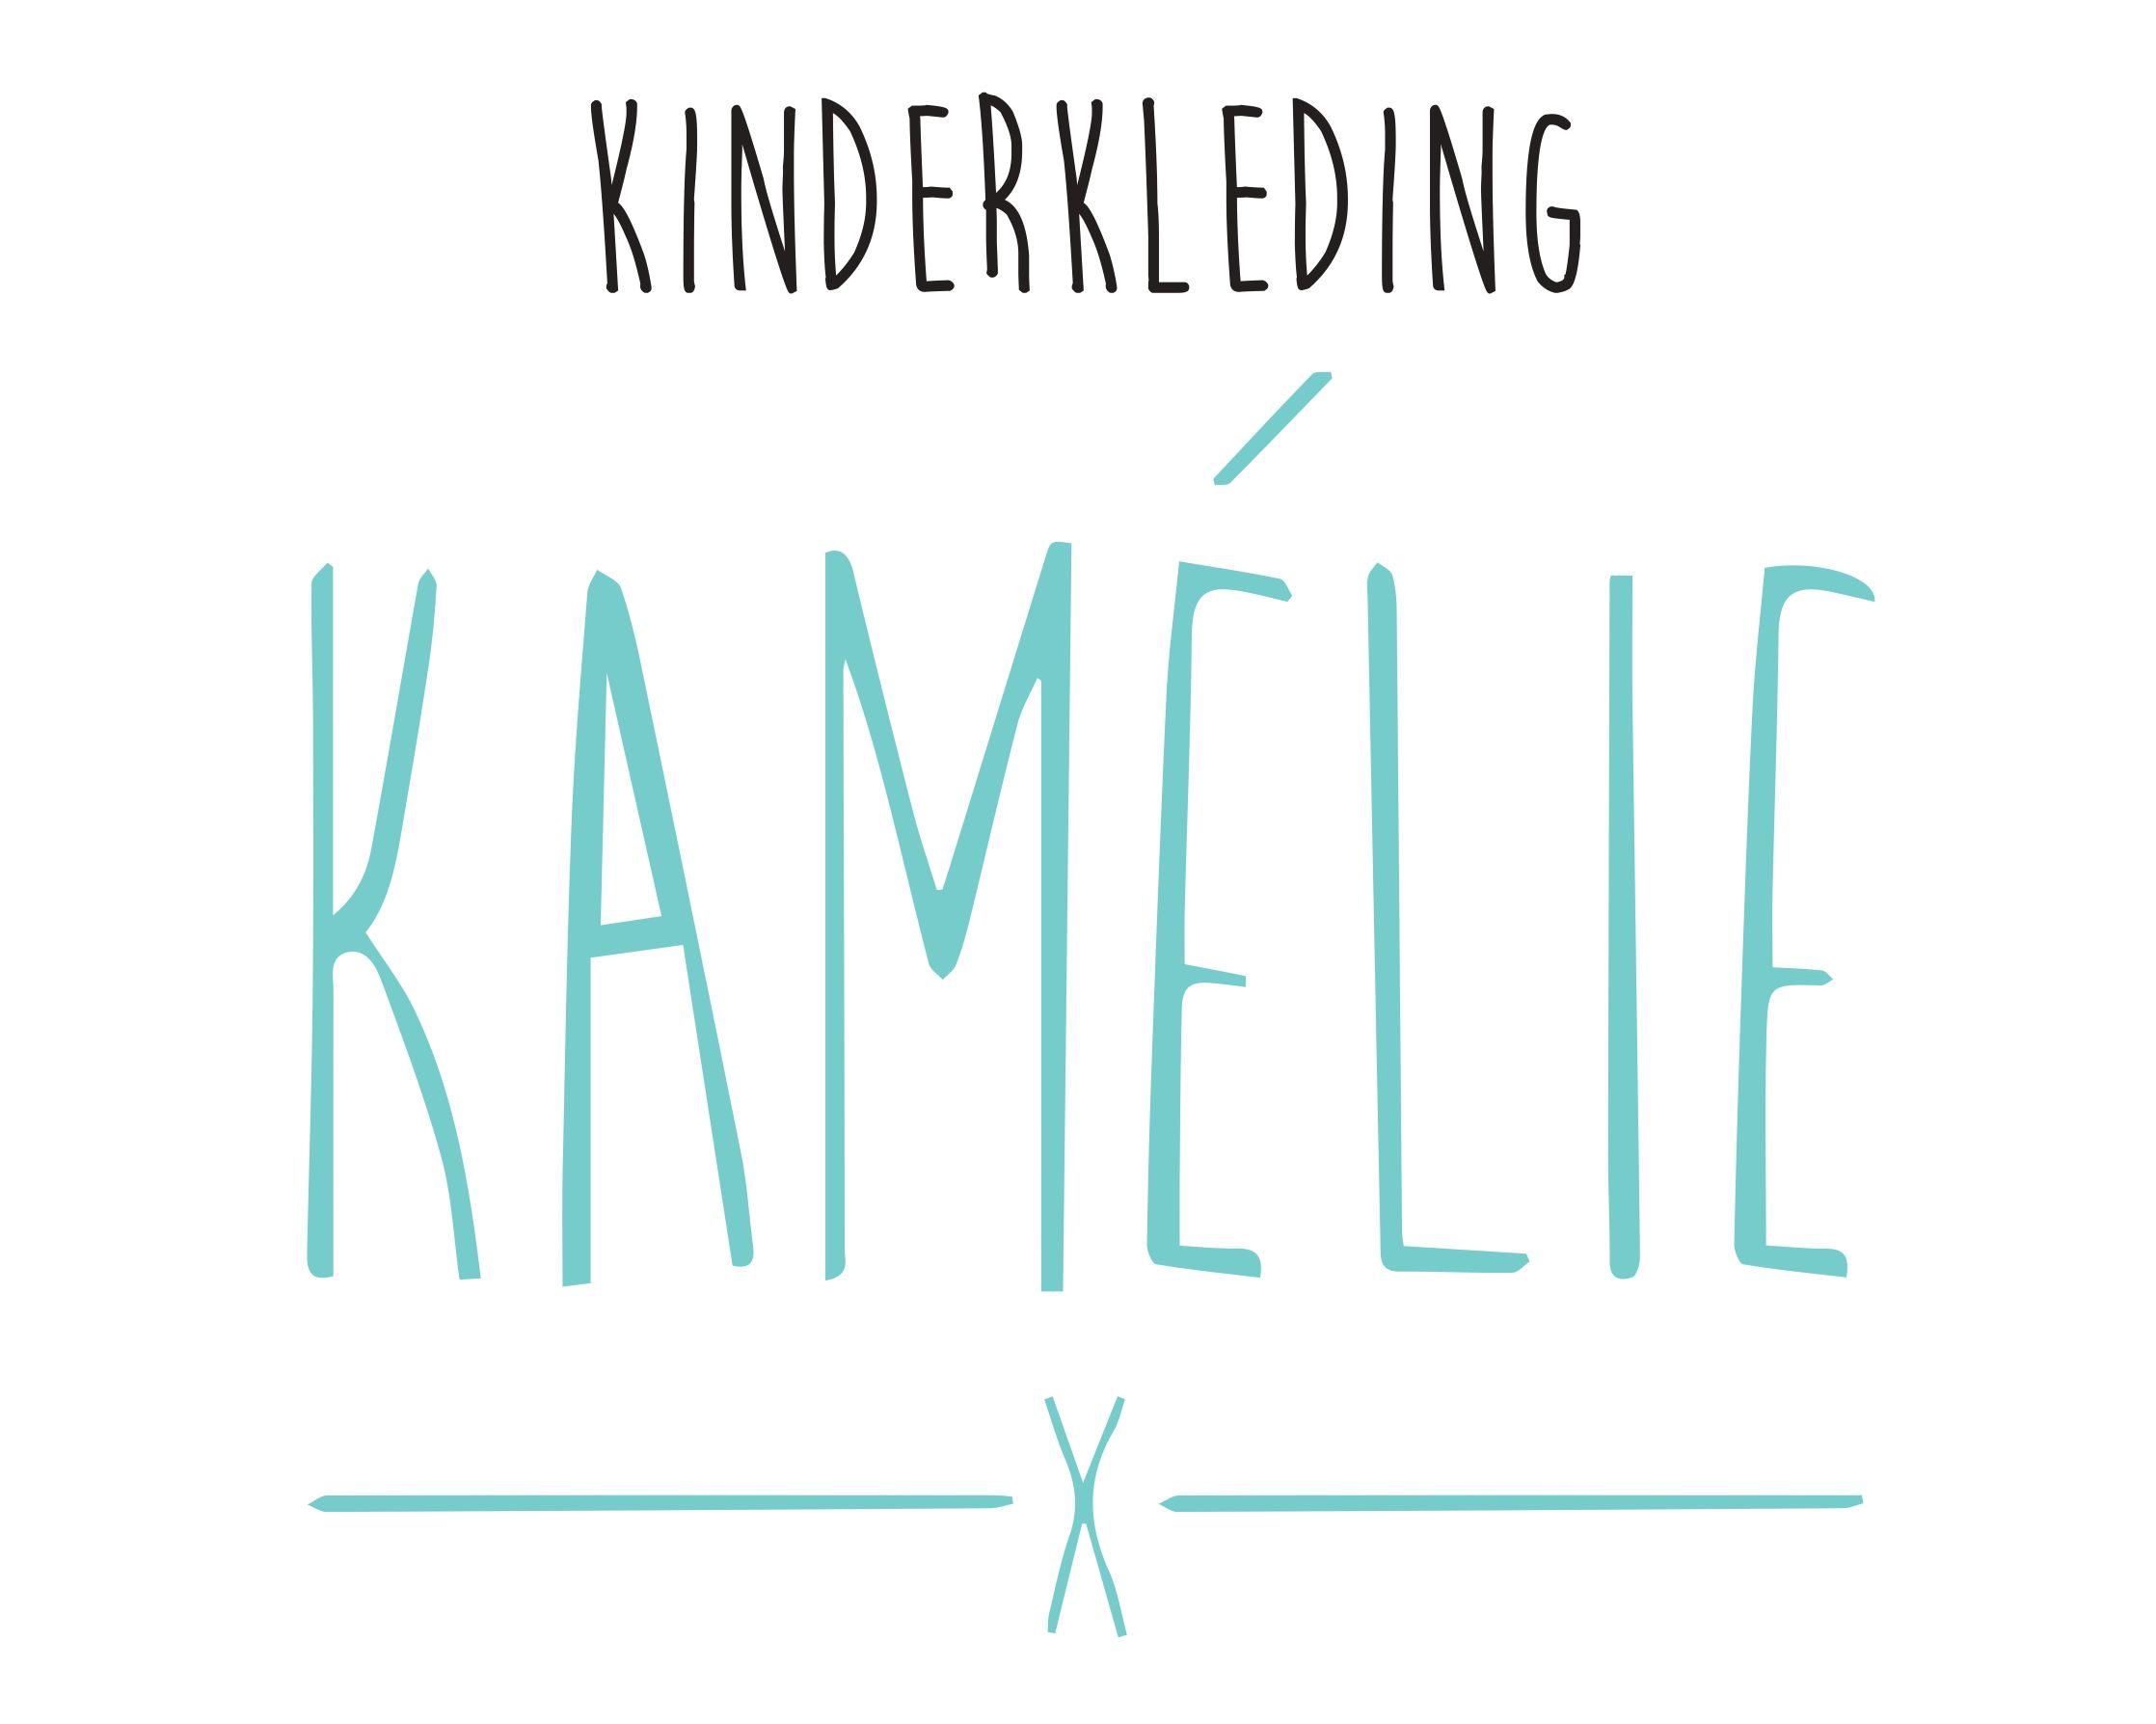 Kinderkleding Kamelie